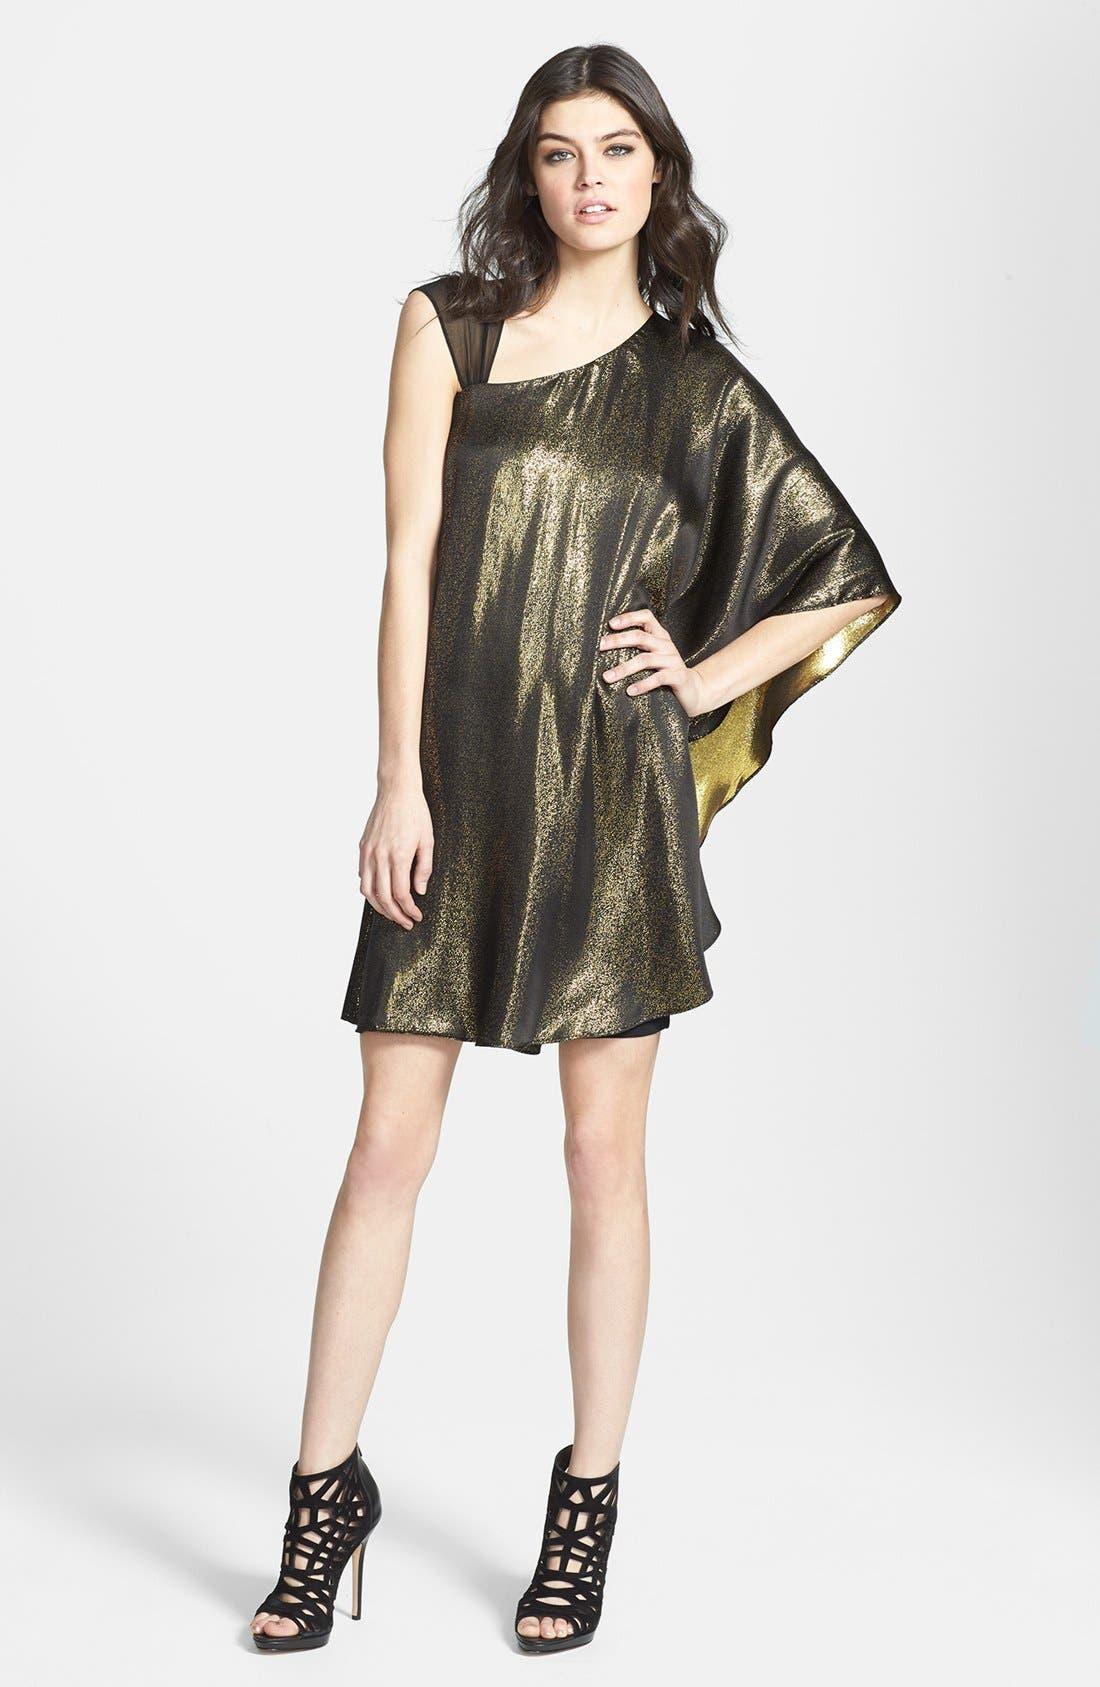 Alternate Image 1 Selected - ERIN erin fetherston 'Lea' Metallic Dress